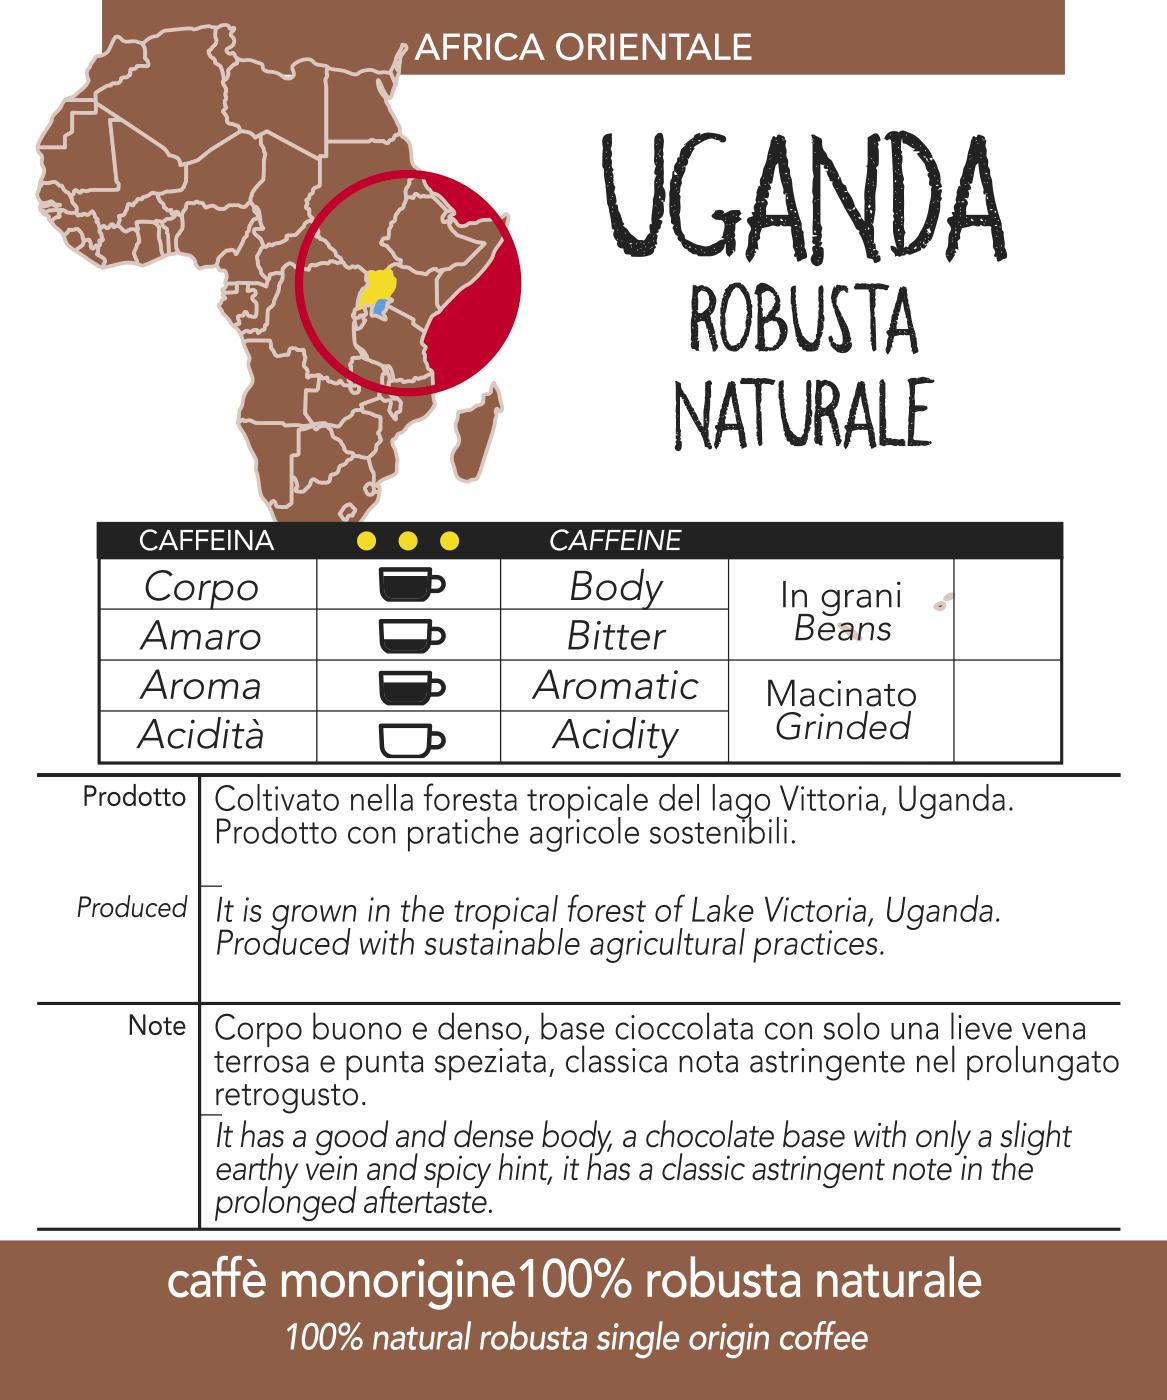 Caffè monorigine in cialda Uganda Naturale, confezione da n. 50 cialde in carta ese 44 mm compatibili